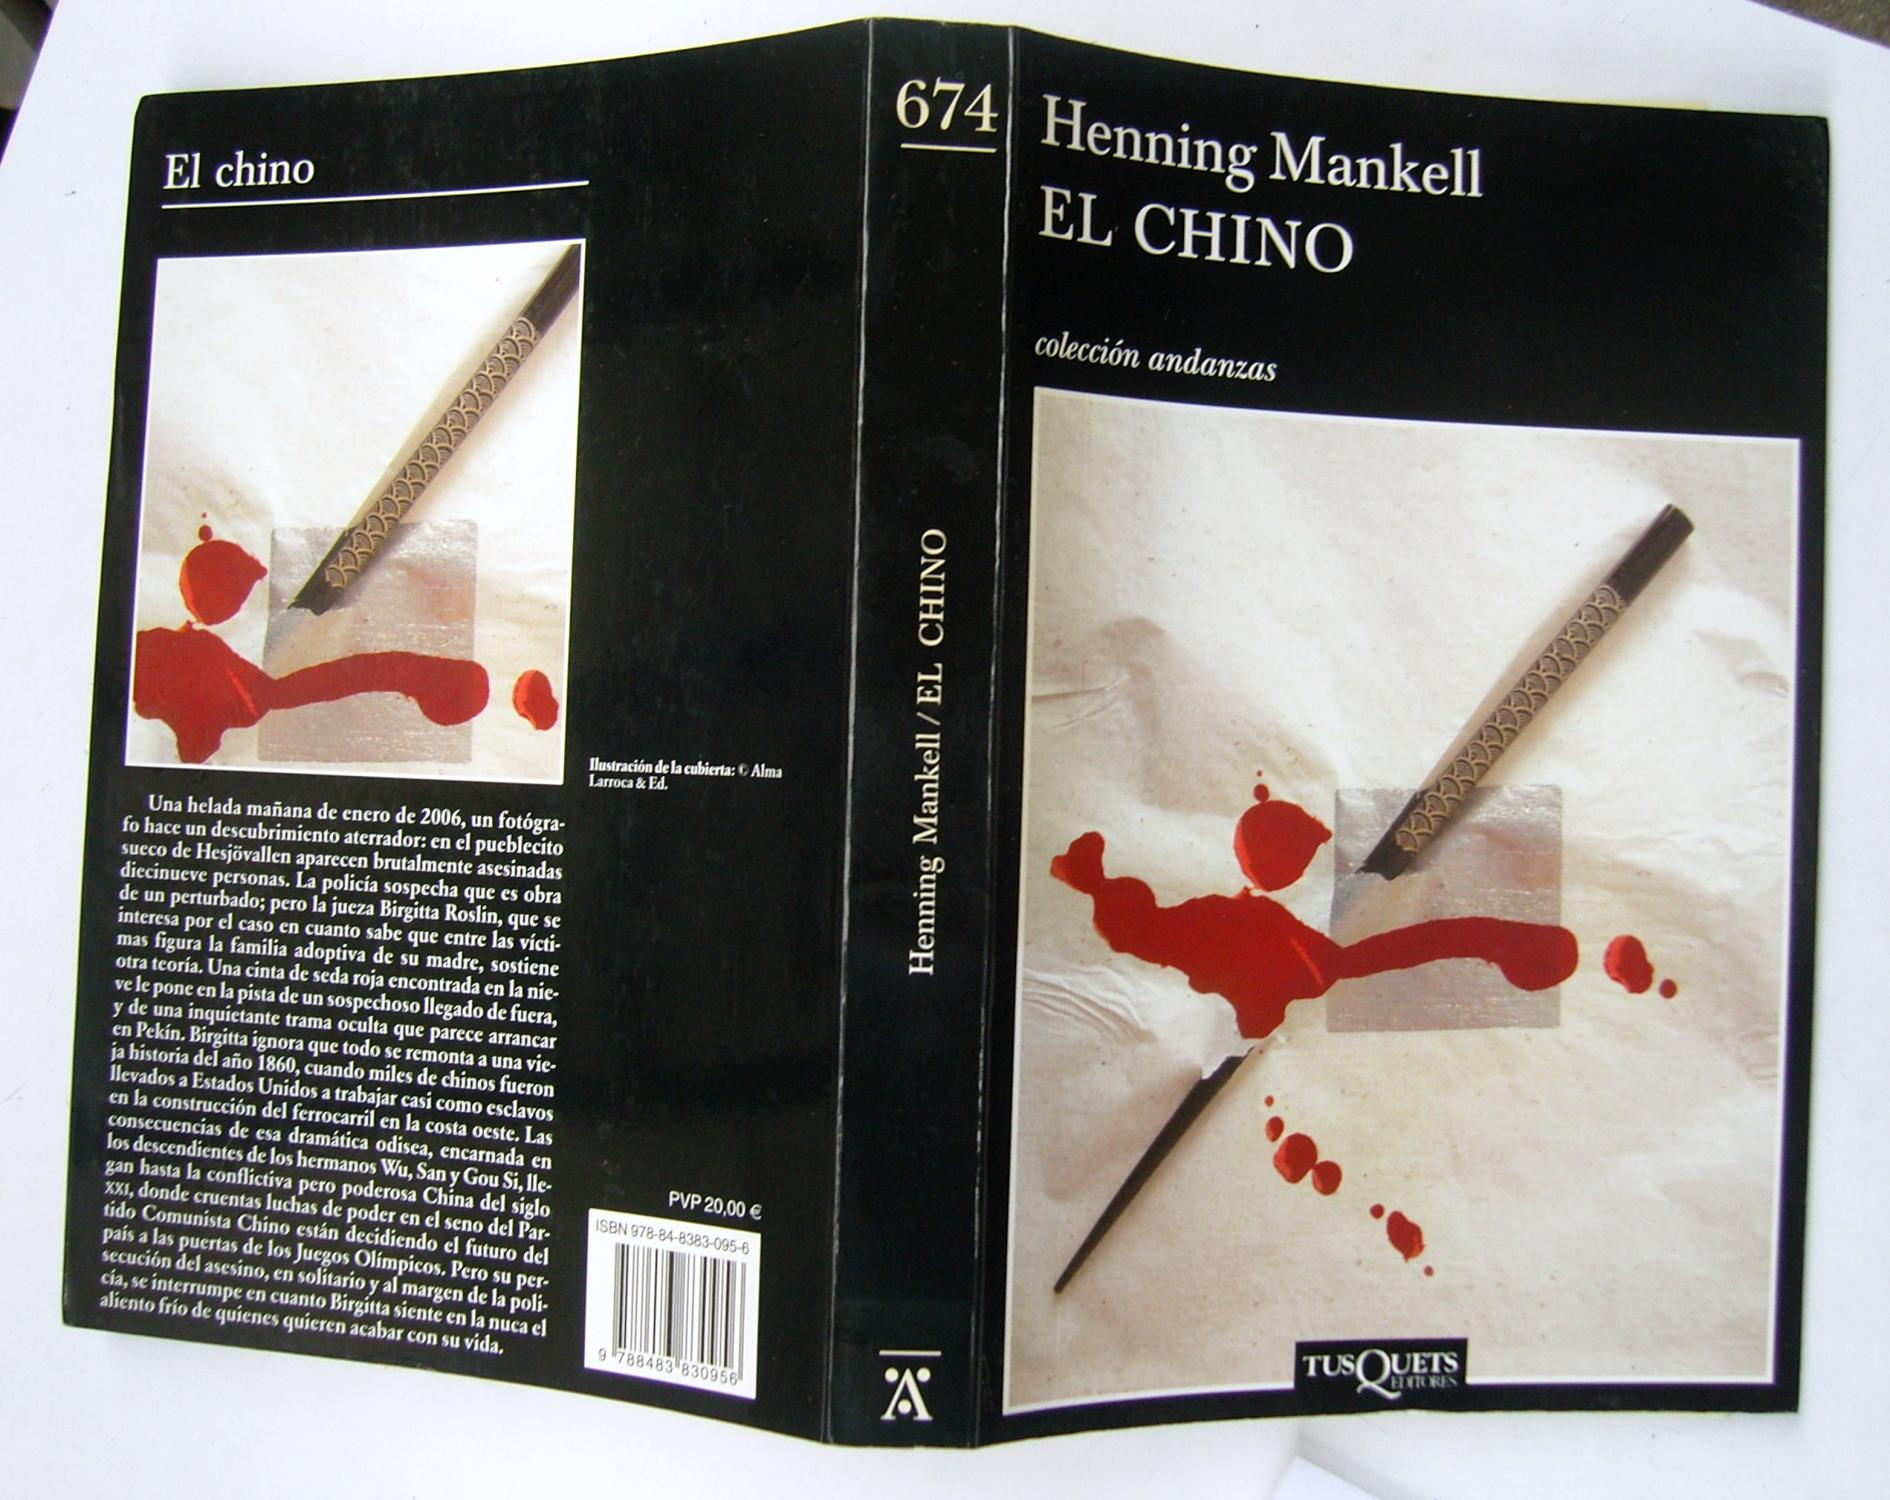 6ee7fce9 El Chino de Henning Mankell: Tusquets Editores, Barcelona, Spain ...